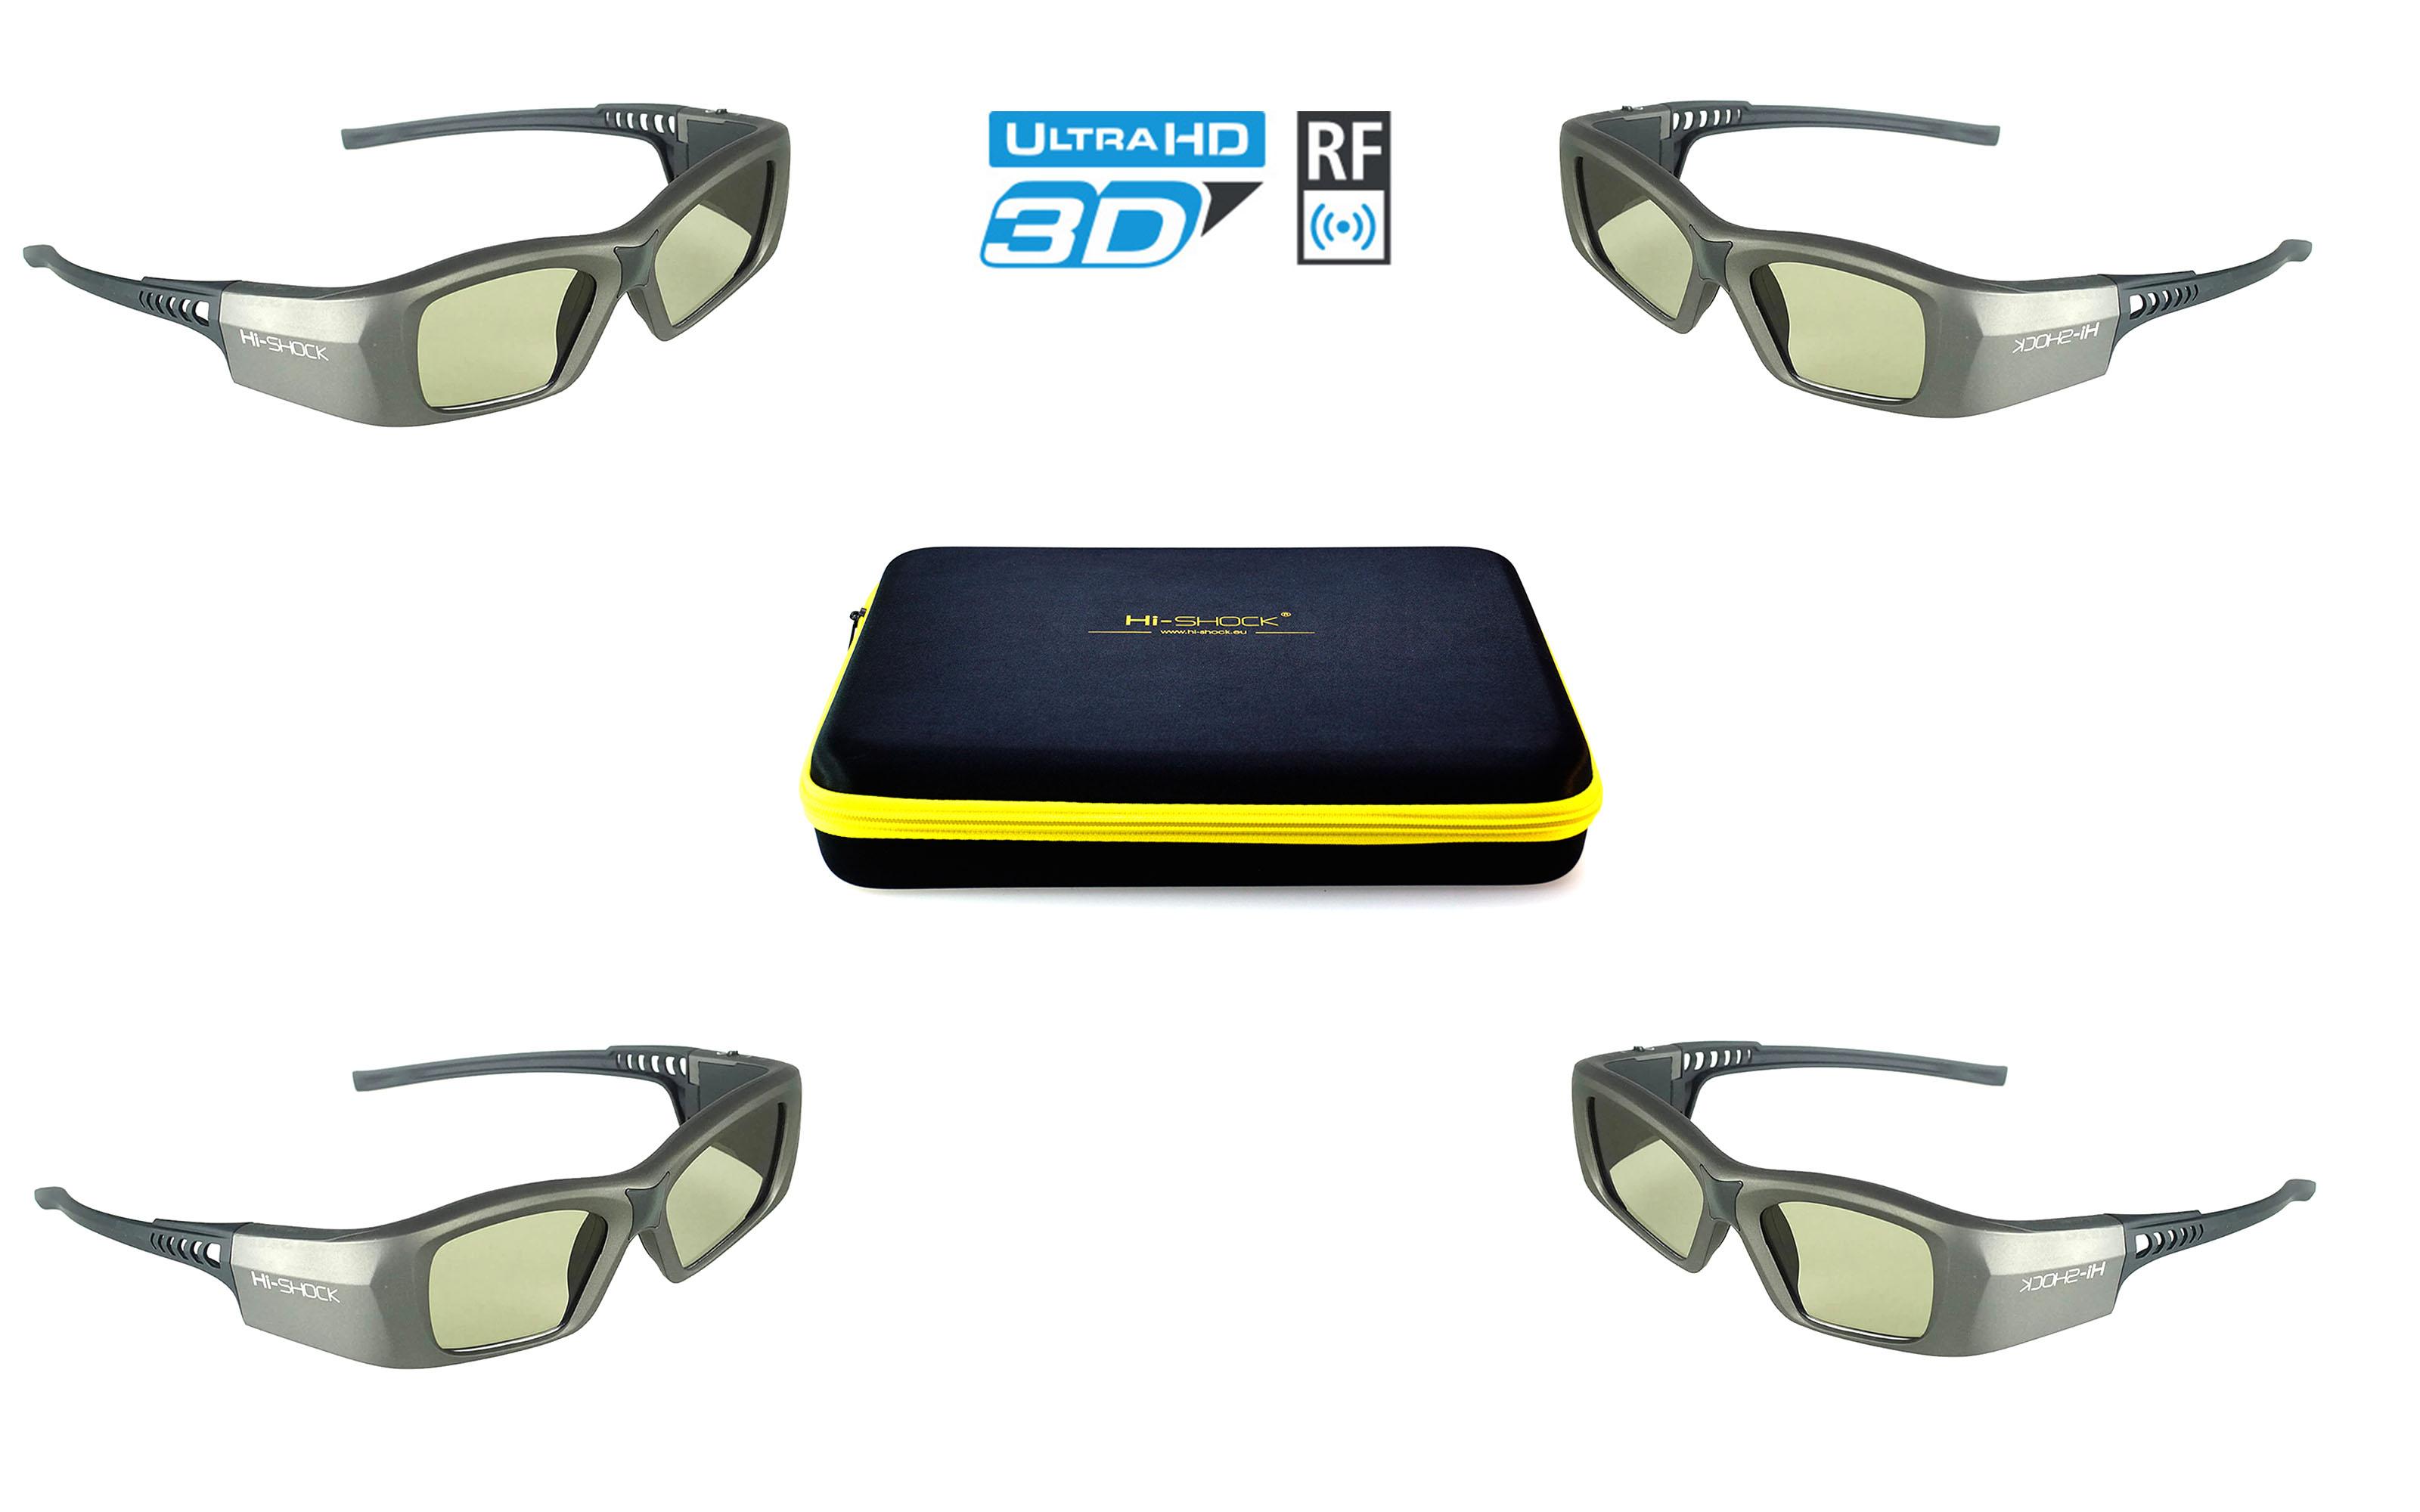 "4x Hi SHOCK RF Pro ""Oxid Diamond"" RF 3D glasses bundle for EPSON JVC SONY RF 3D projector"